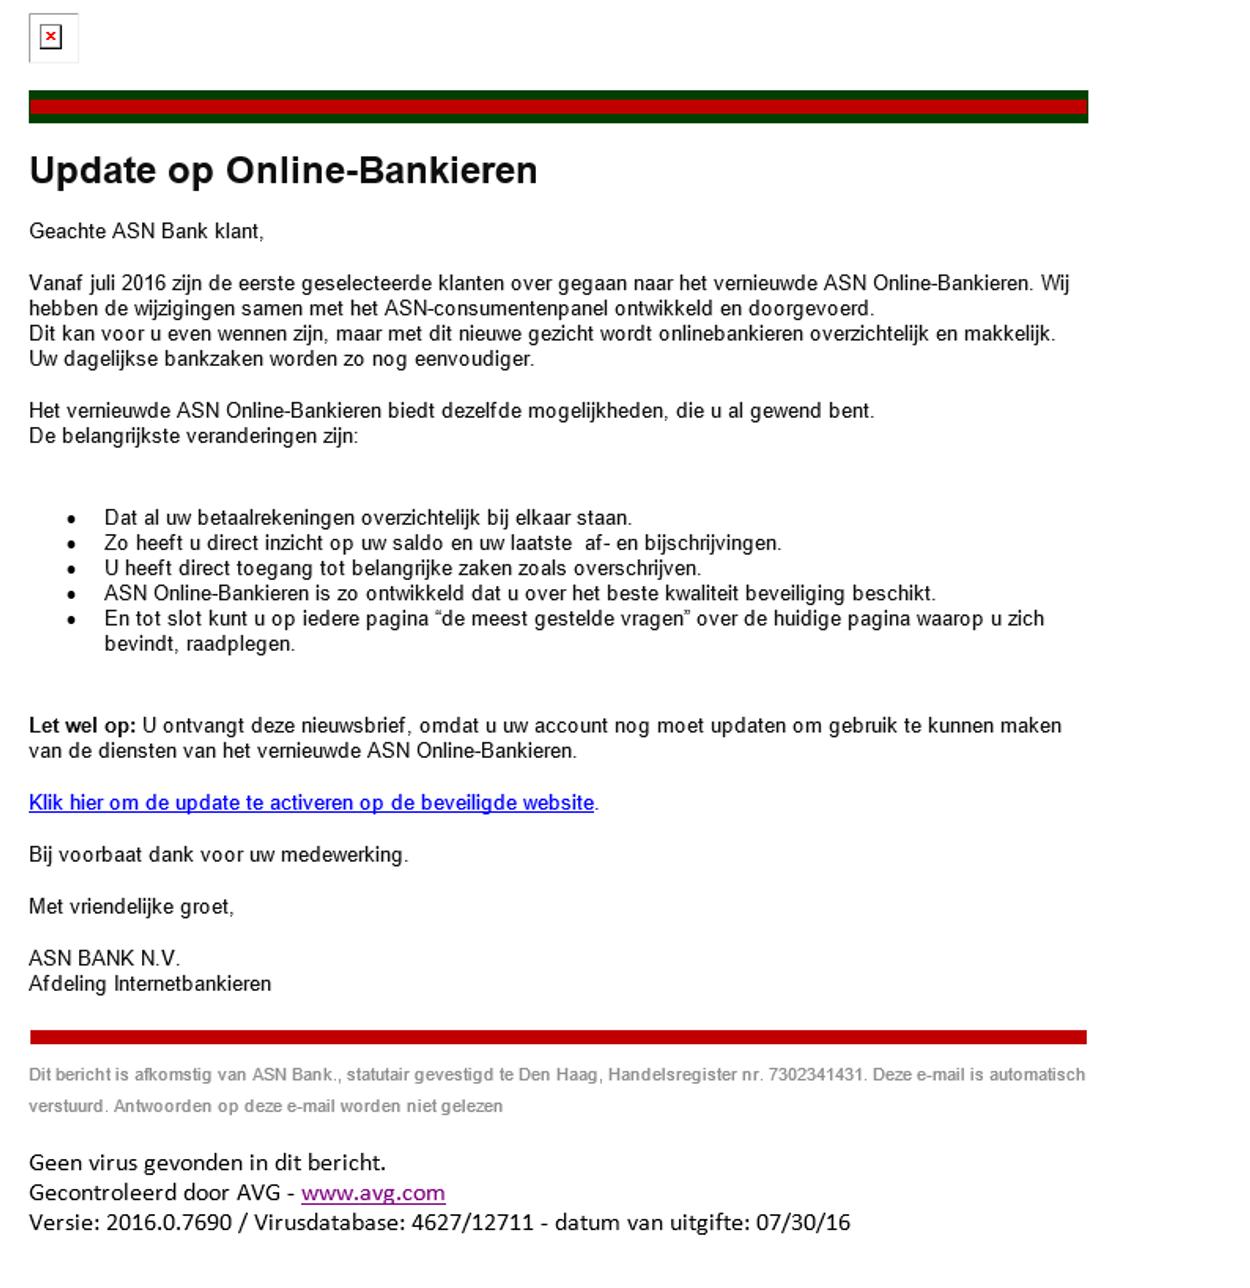 asn online-bankieren